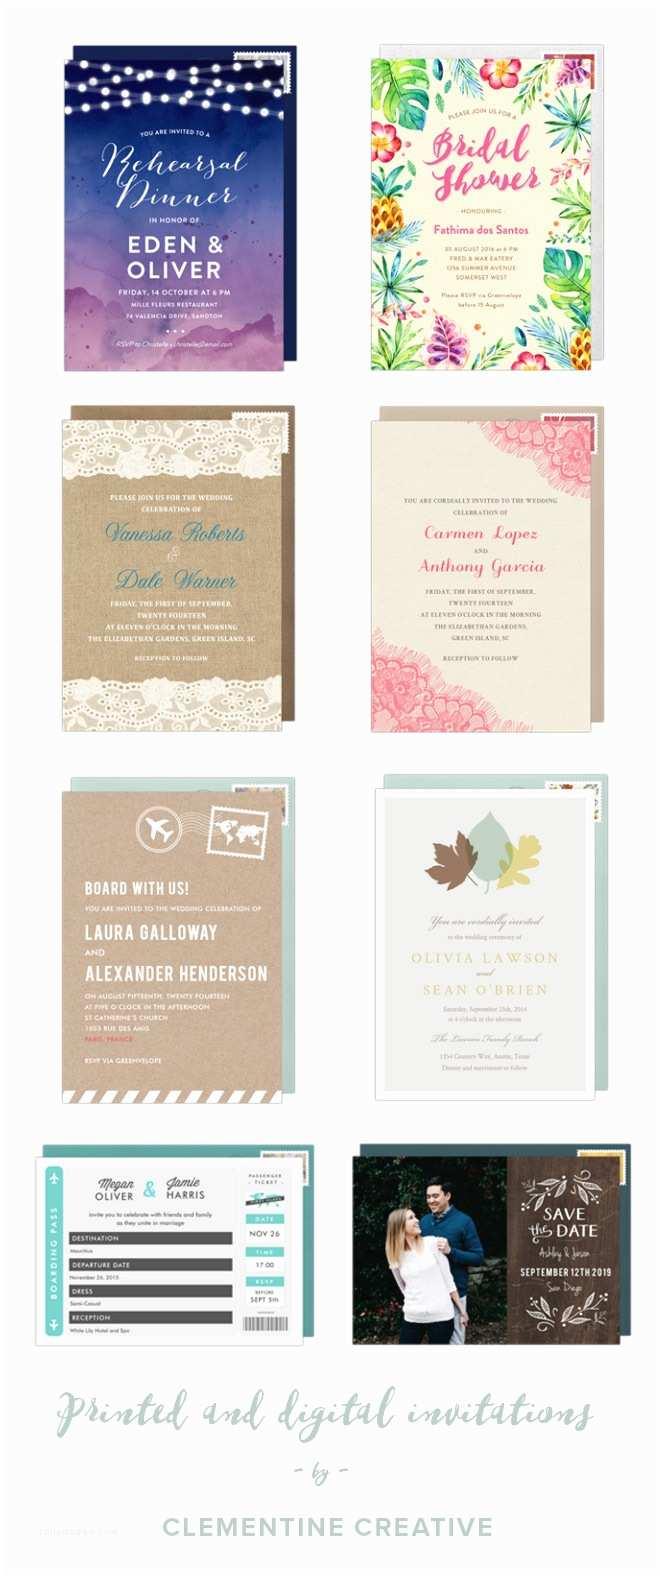 Best Wedding Invitation Websites Templates Wedding Invitation Website Creation to Her